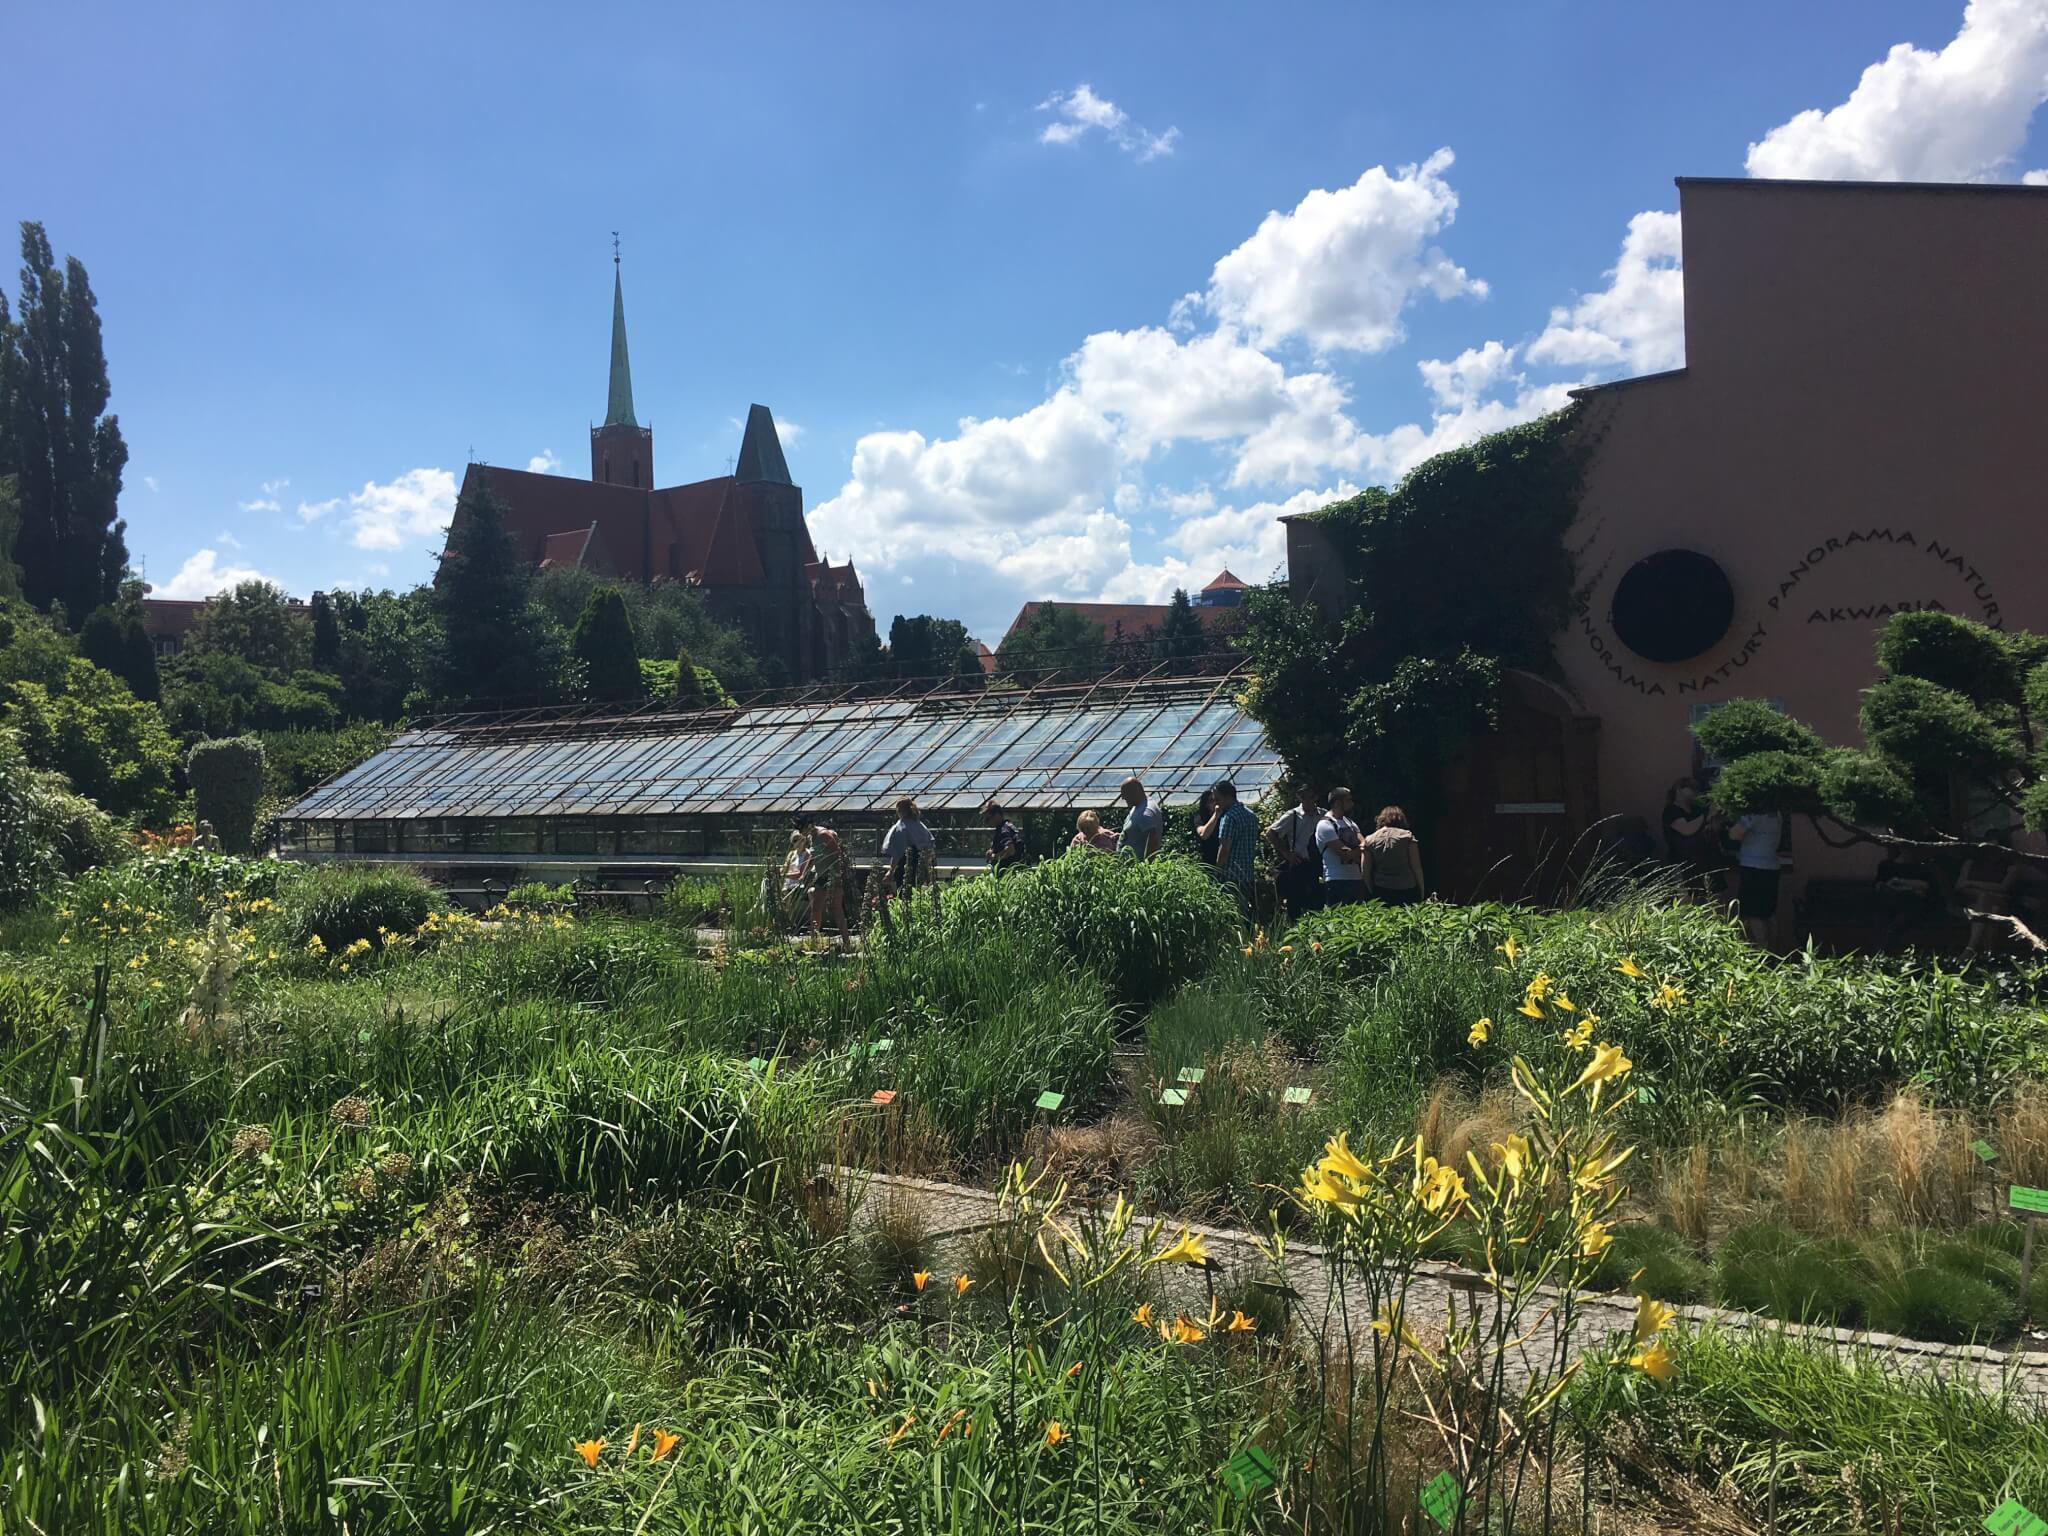 Botanical garden, Wroclaw